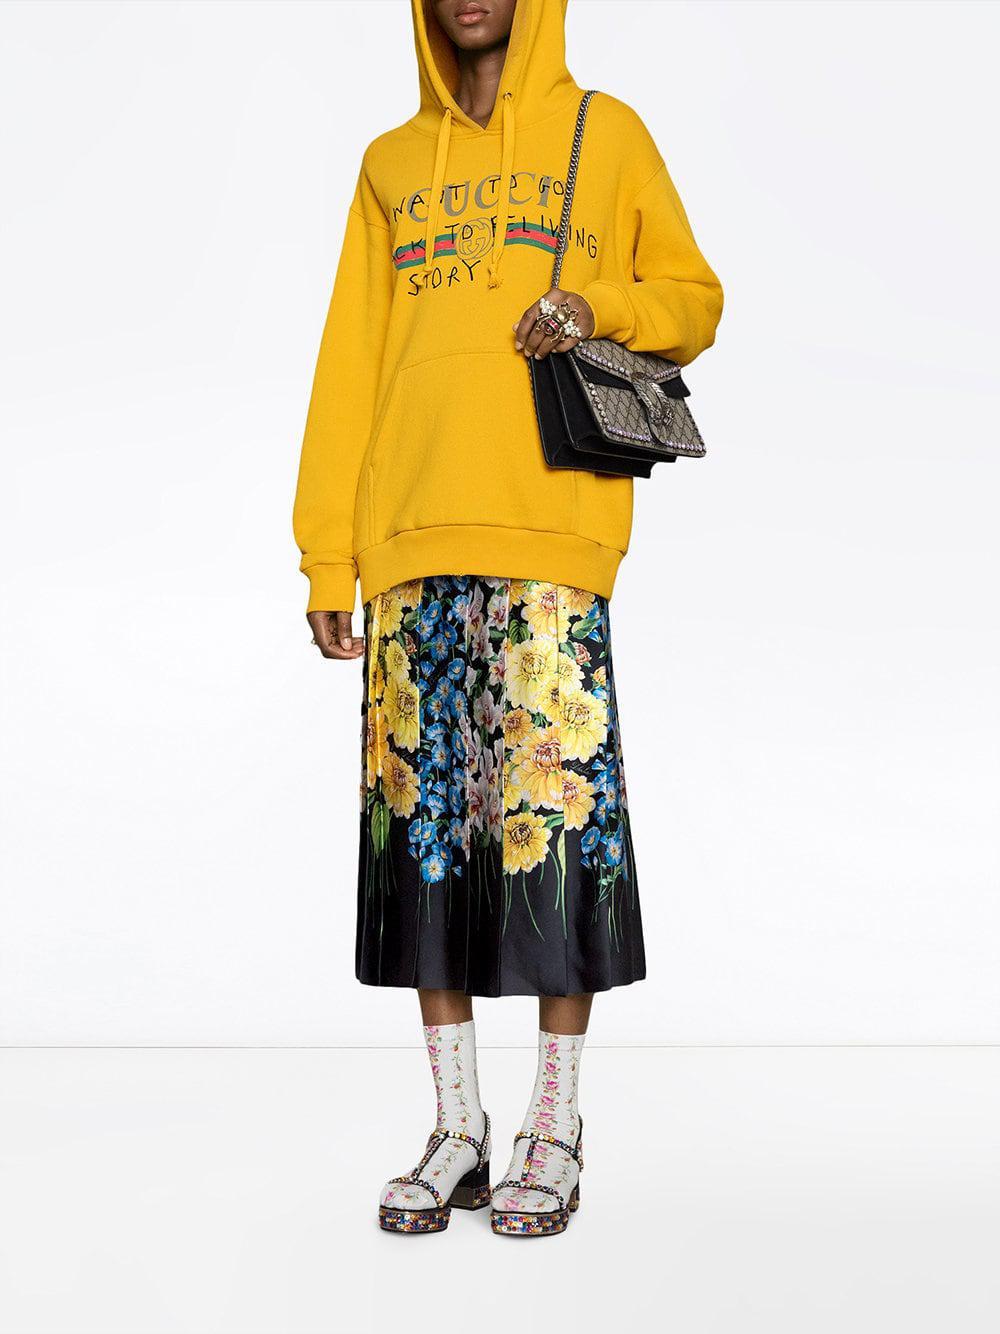 c79a580c1ad Gucci Dionysus GG Supreme Shoulder Bag - Save 21% - Lyst